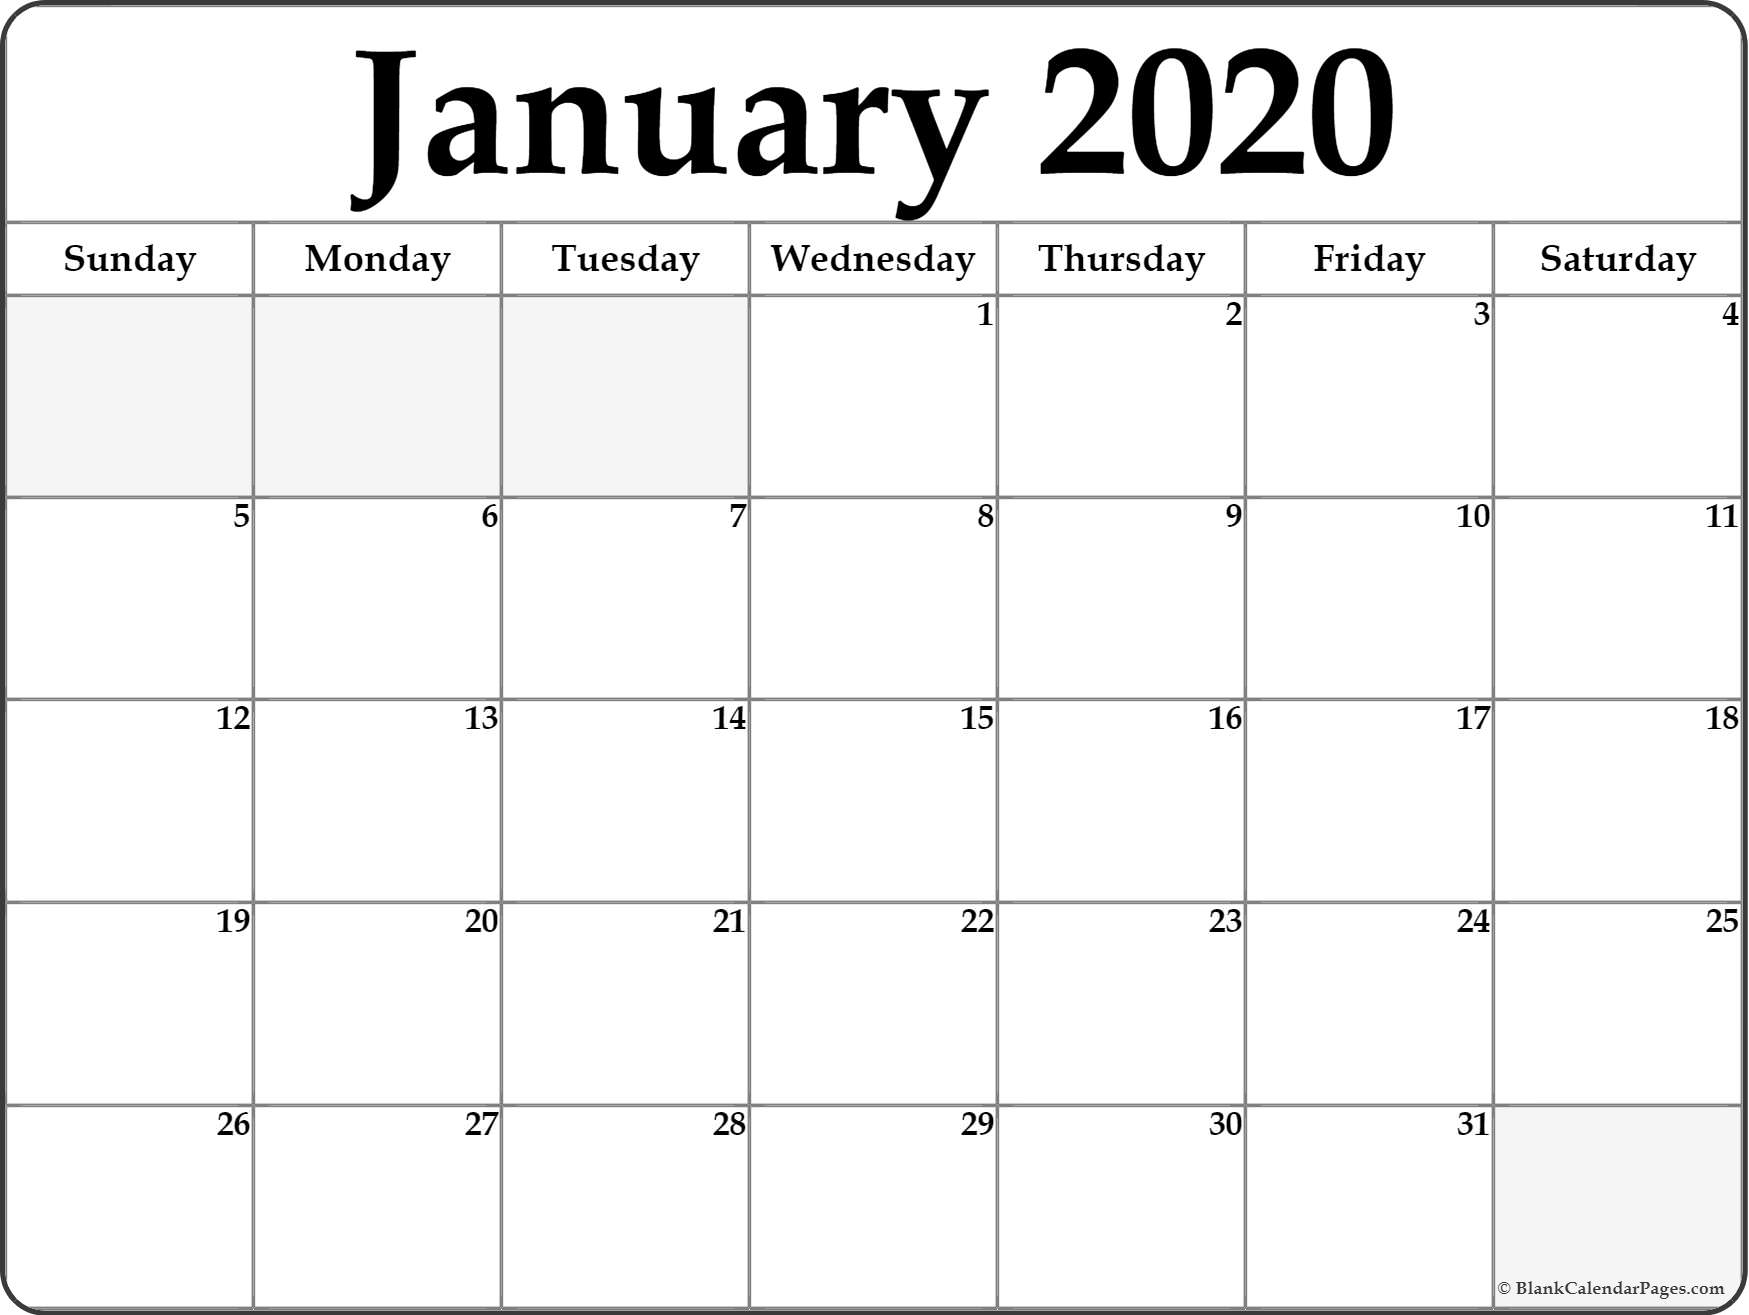 January 2020 Calendar Spot - Togo.wpart.co